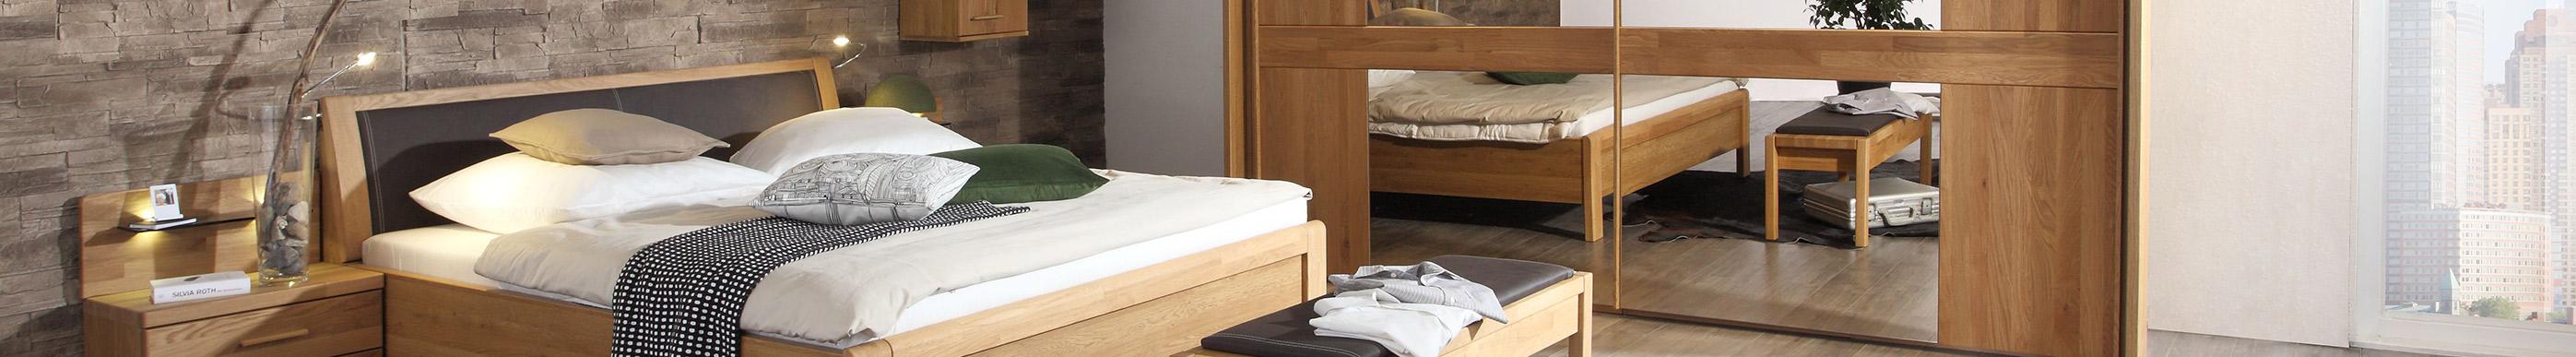 meubles belgique magasin ameublement chambres coucher. Black Bedroom Furniture Sets. Home Design Ideas